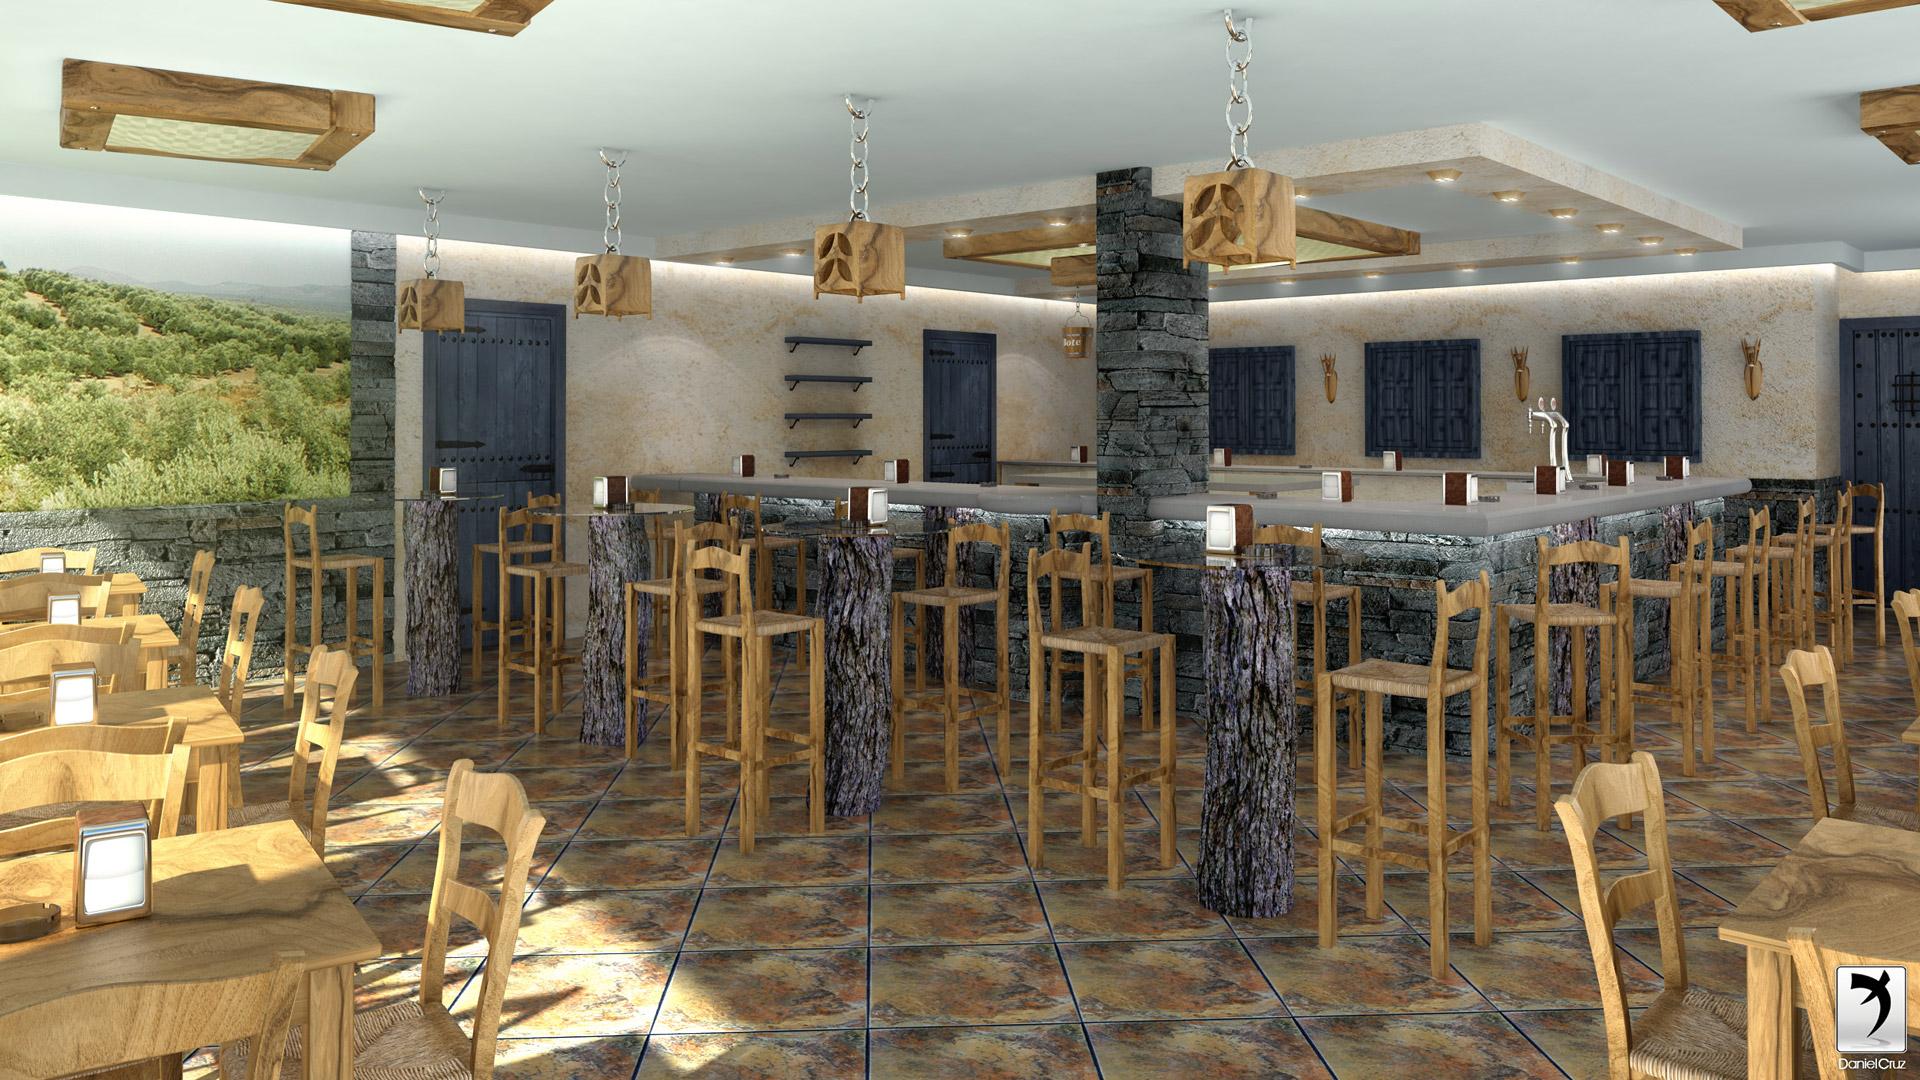 decoracion de interiores bares rusticos: -3ds-max-bar-restaurante-rustico-bar-alcala-vista-2-final.jpg